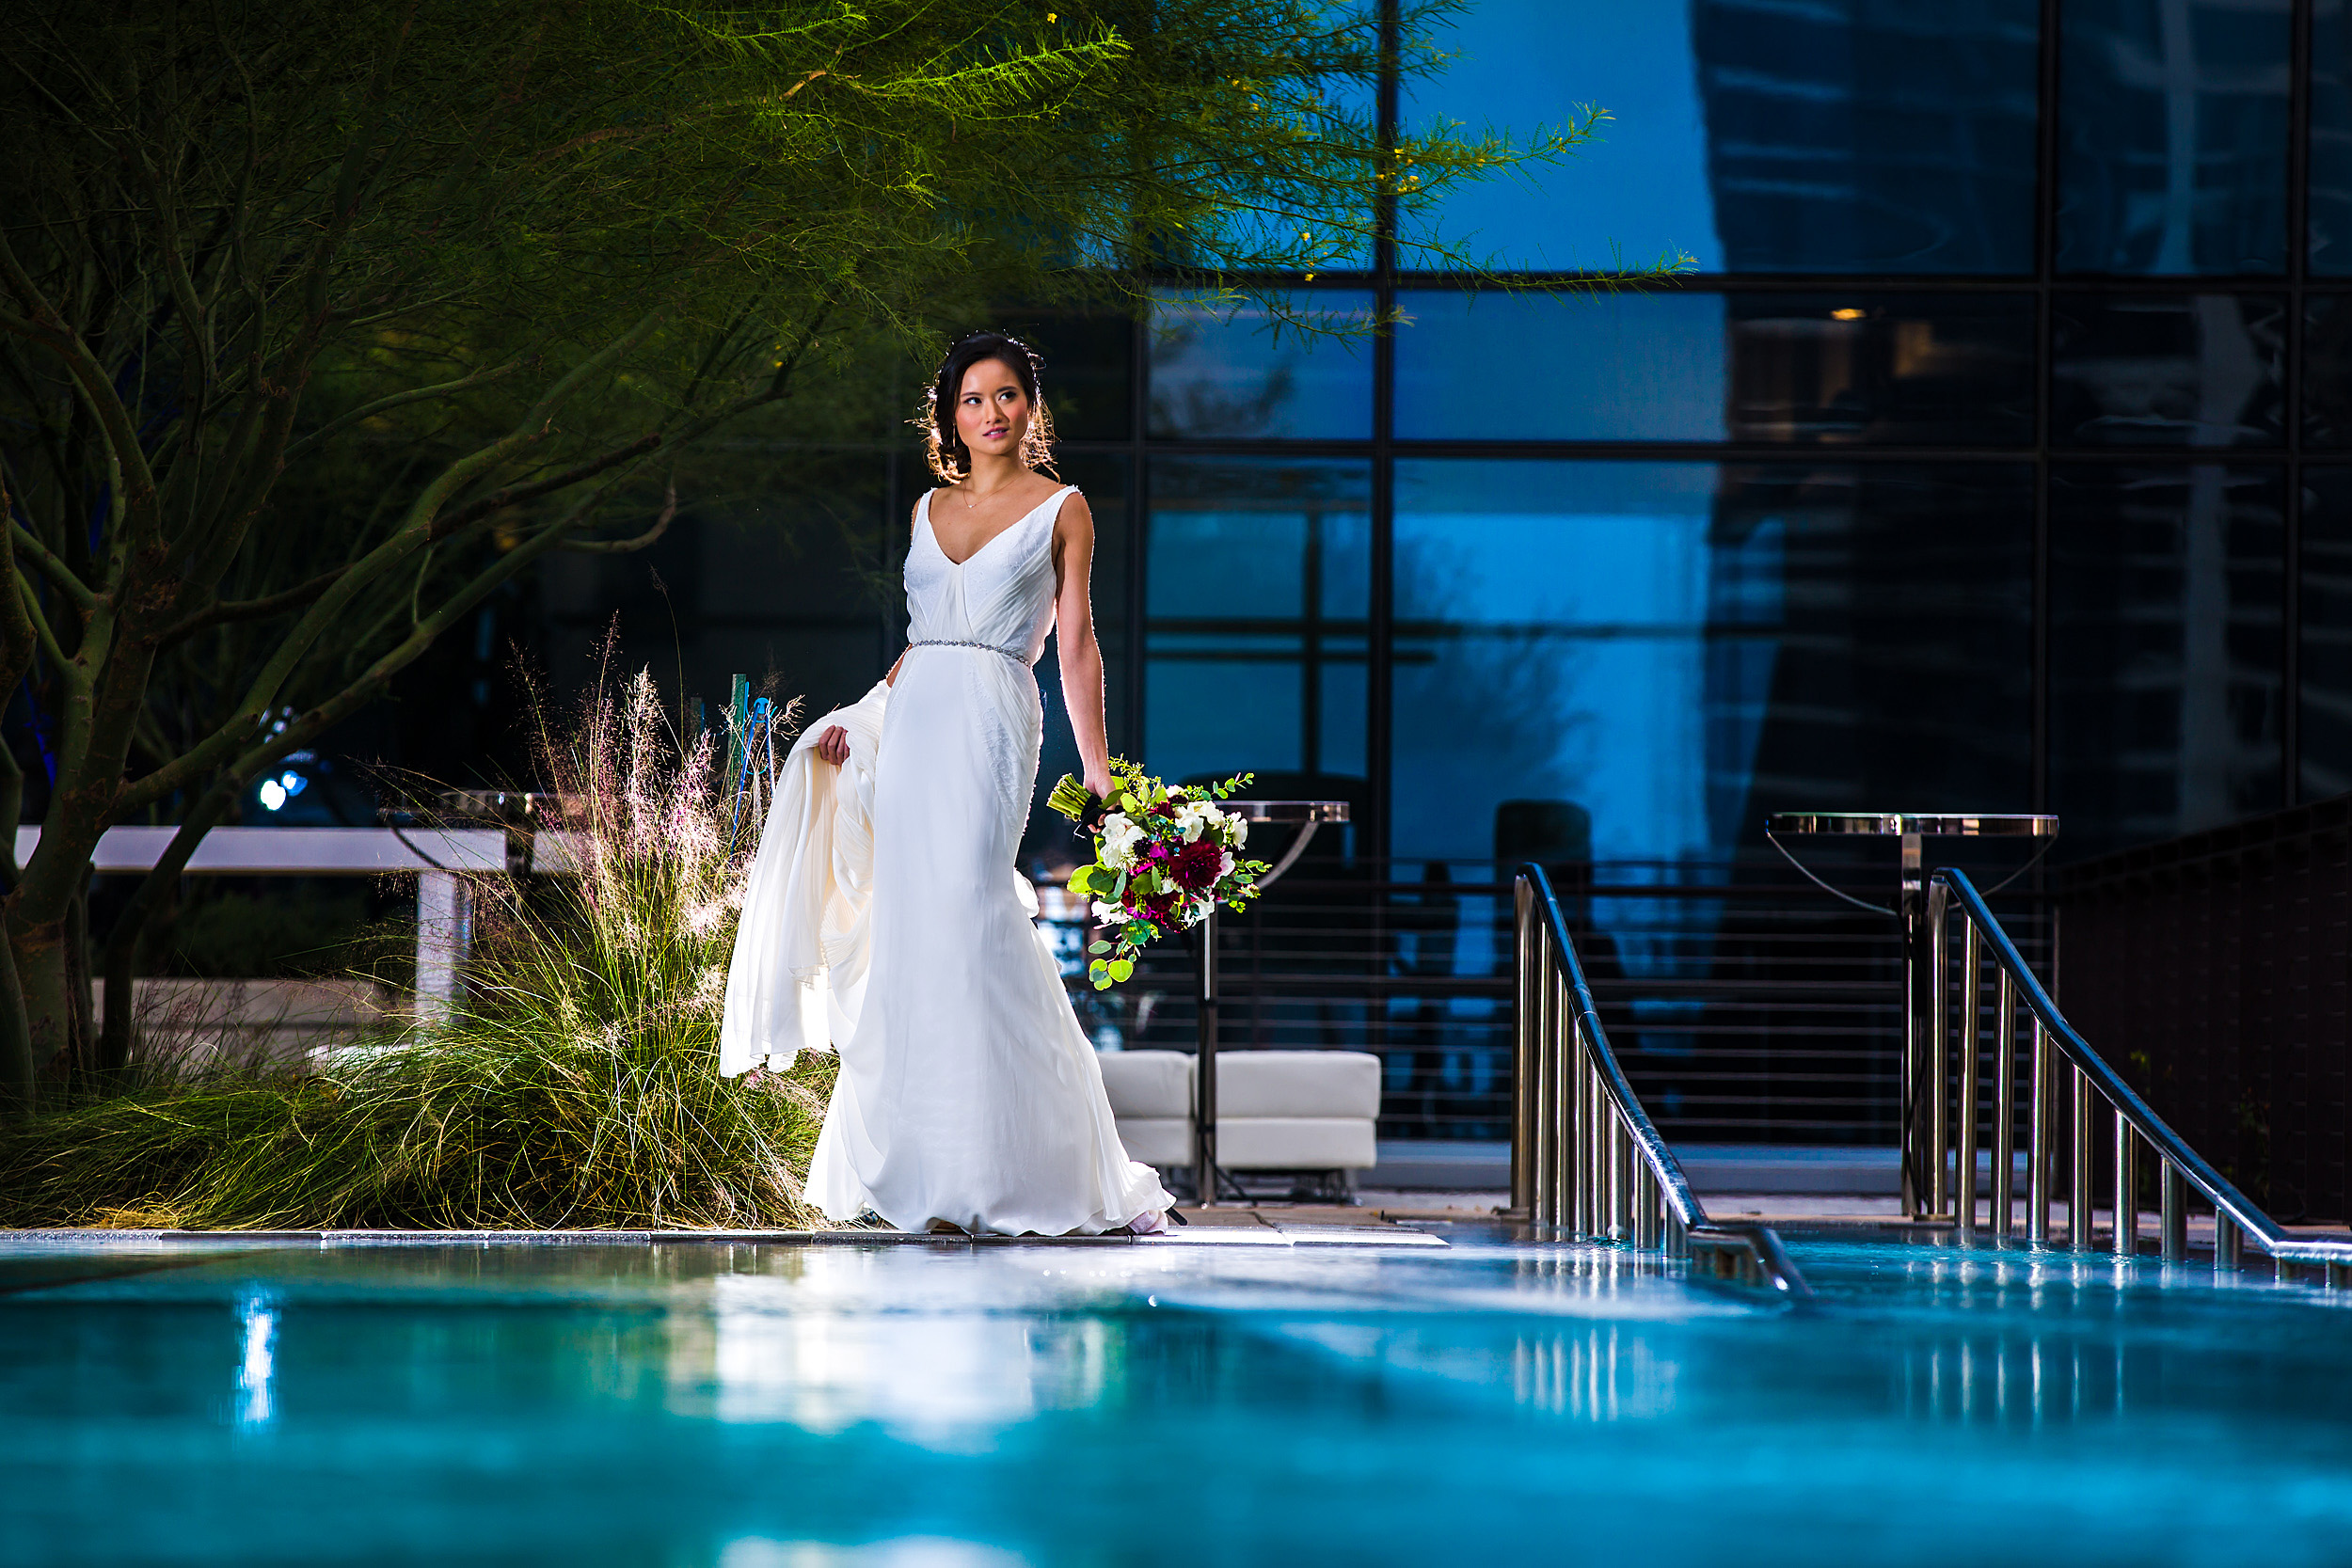 austin-wedding-mike-reed-33.jpg